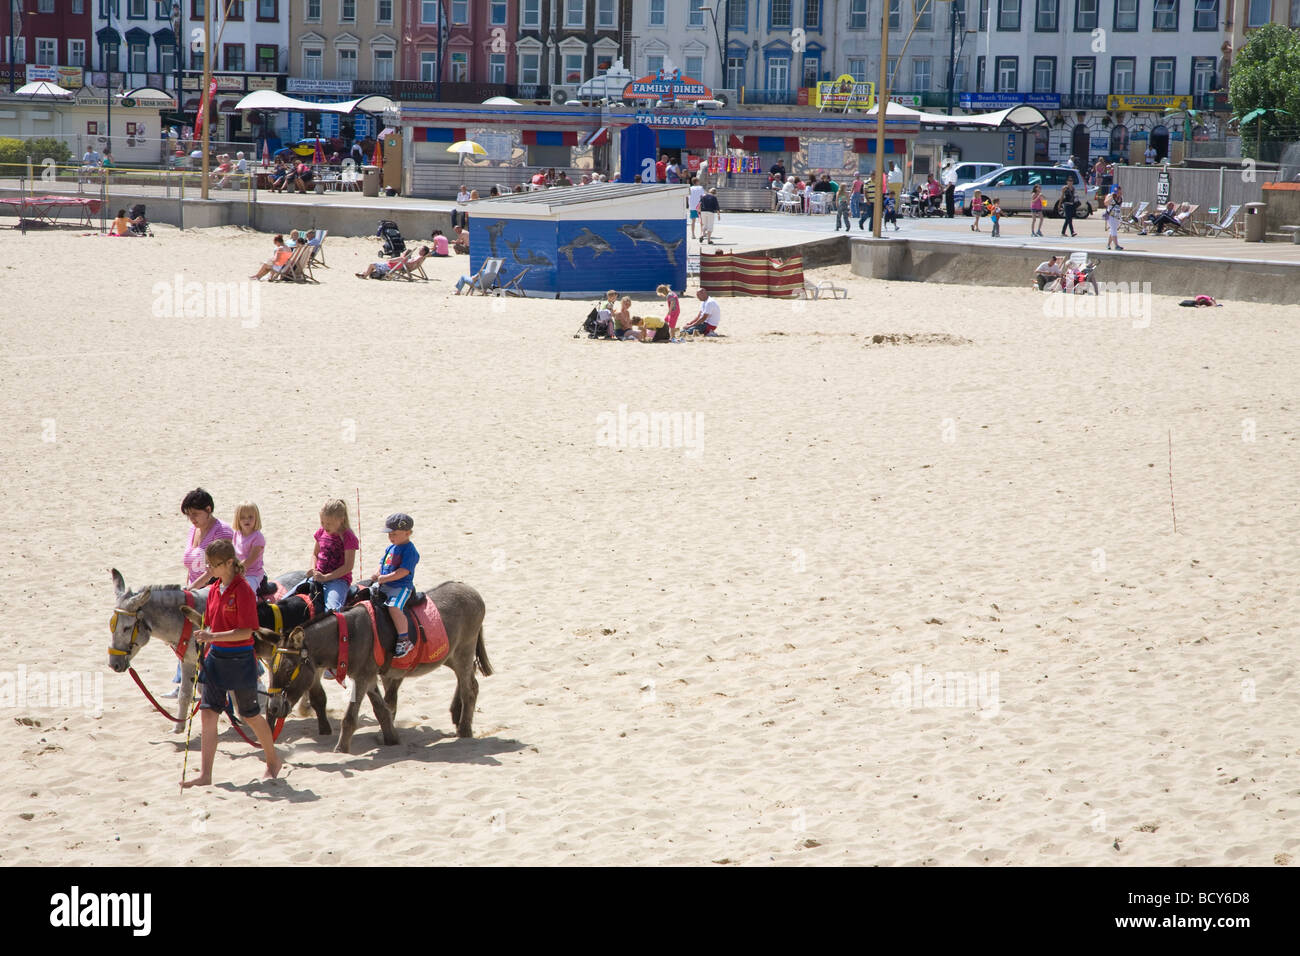 Children ride on the donkeys on Great Yarmouth's sandy beach Stock Photo